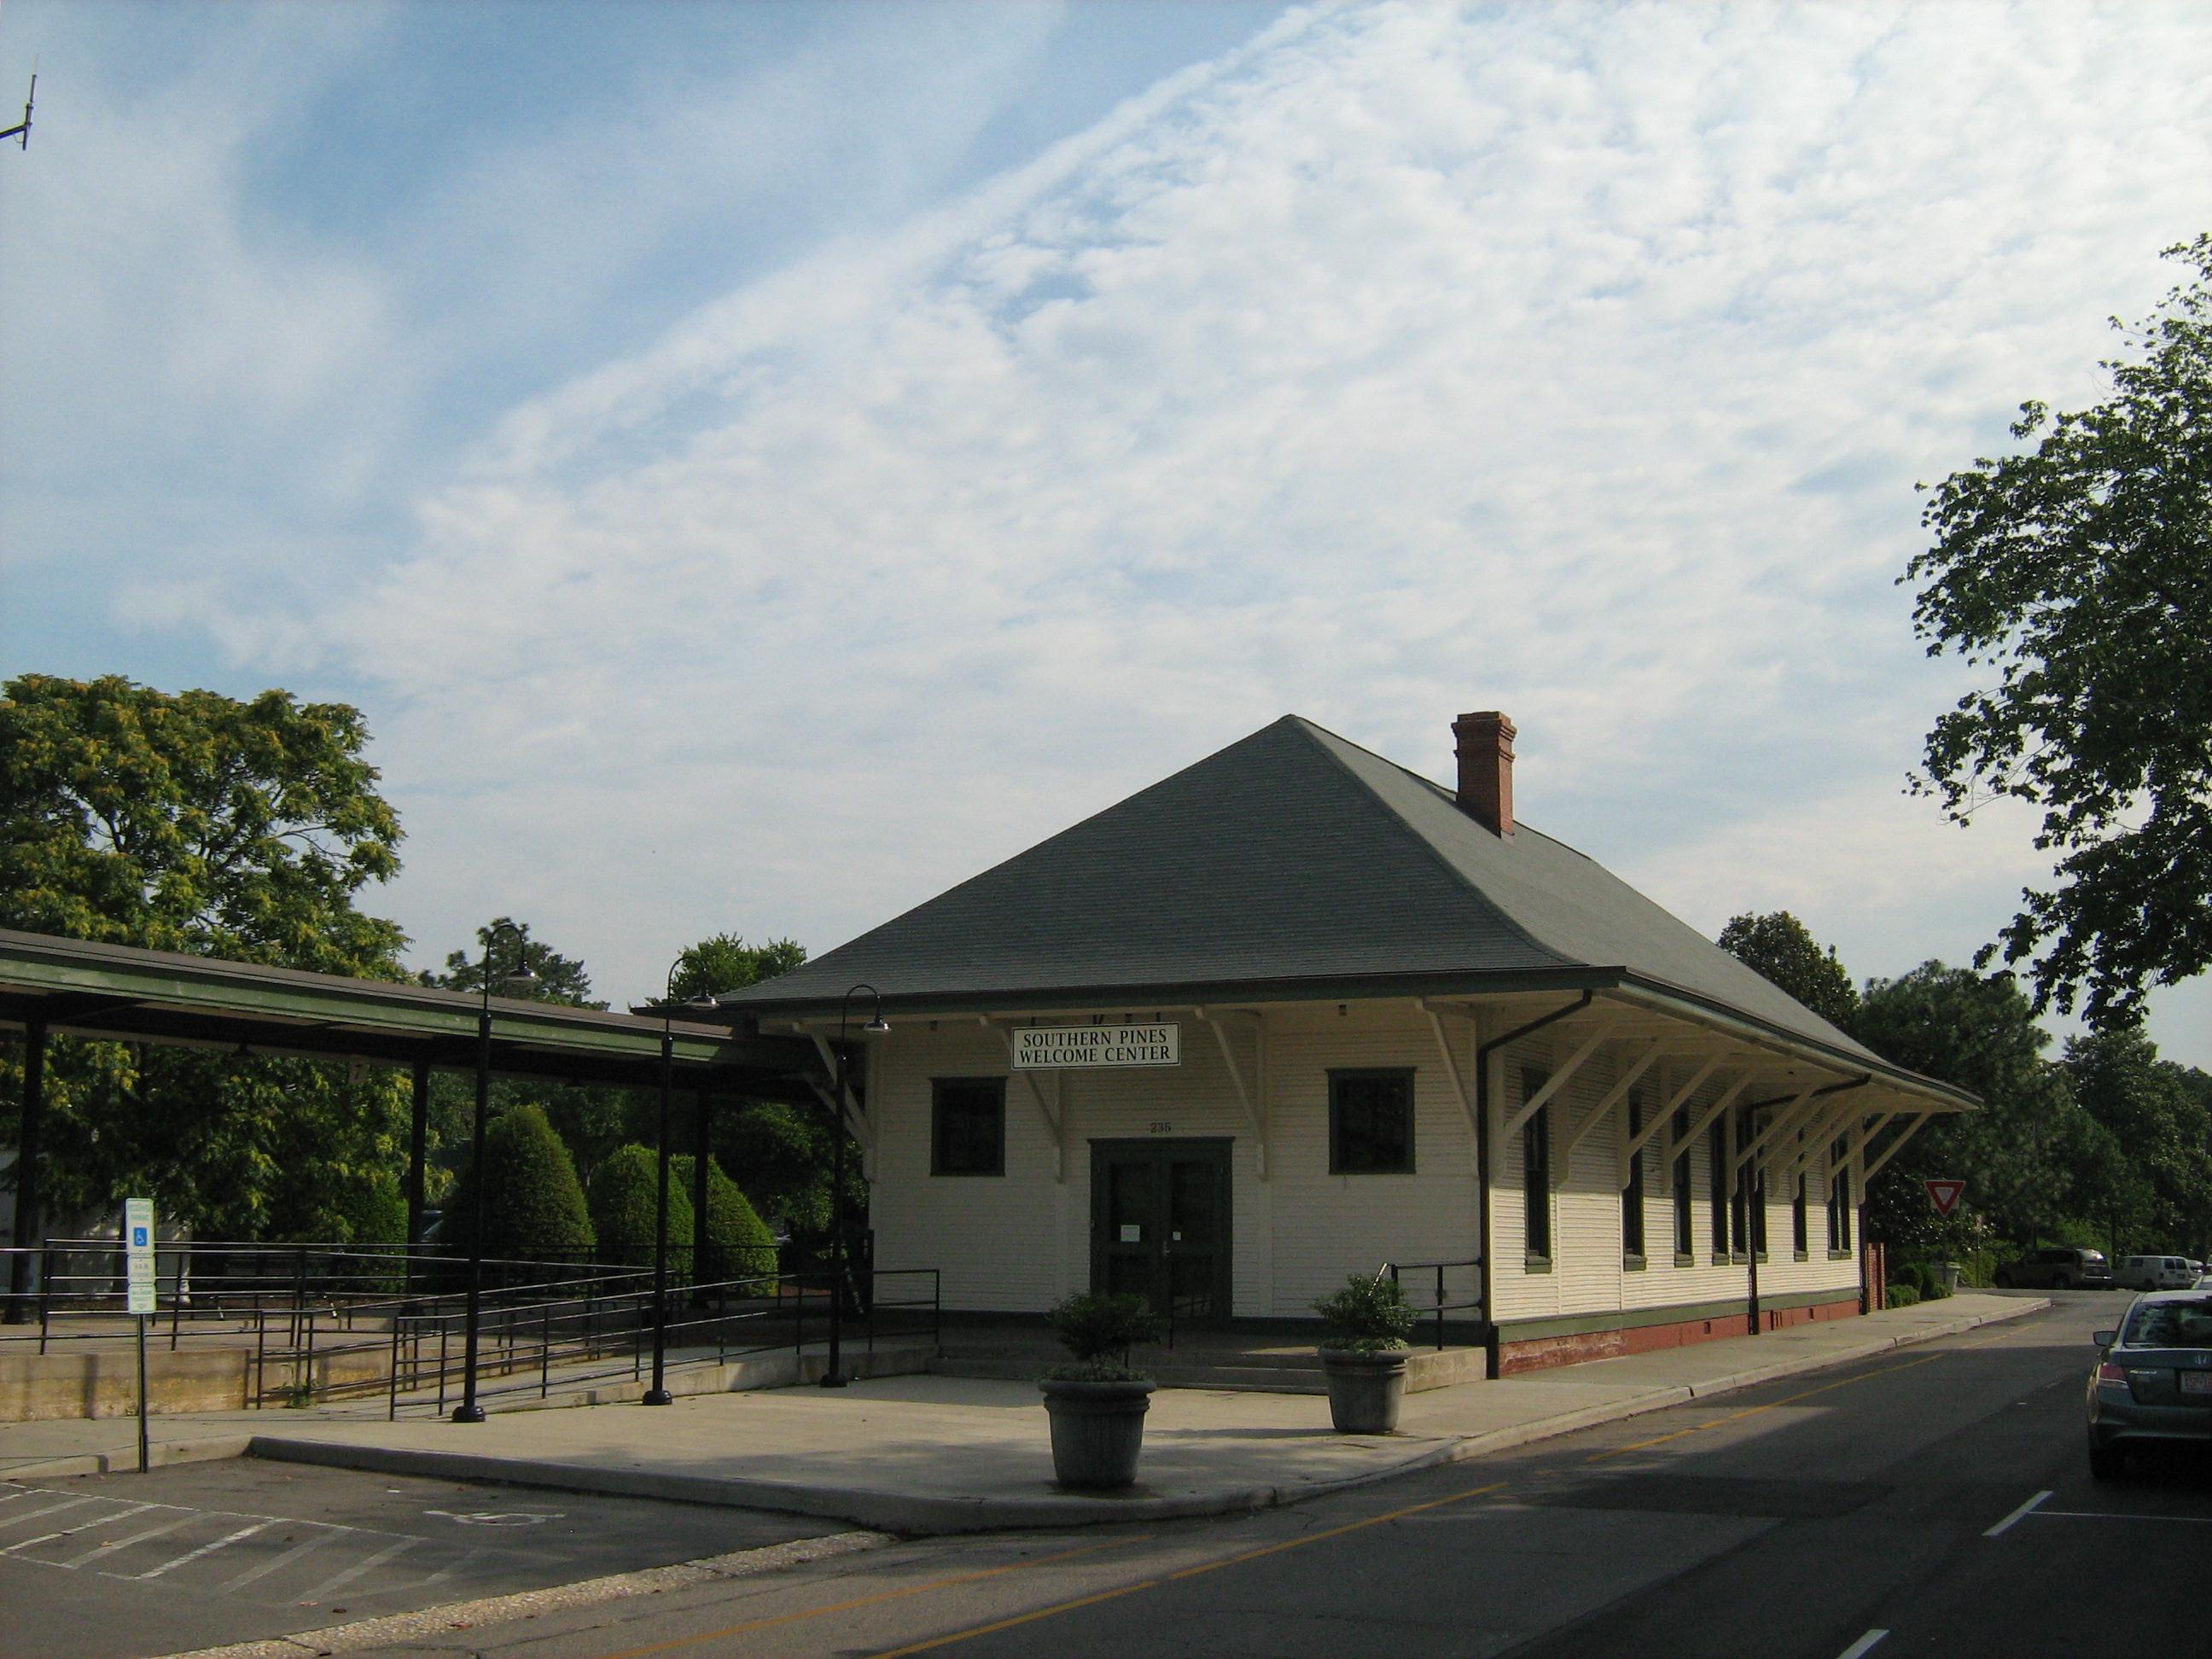 Southern Pines Nc Food Bank